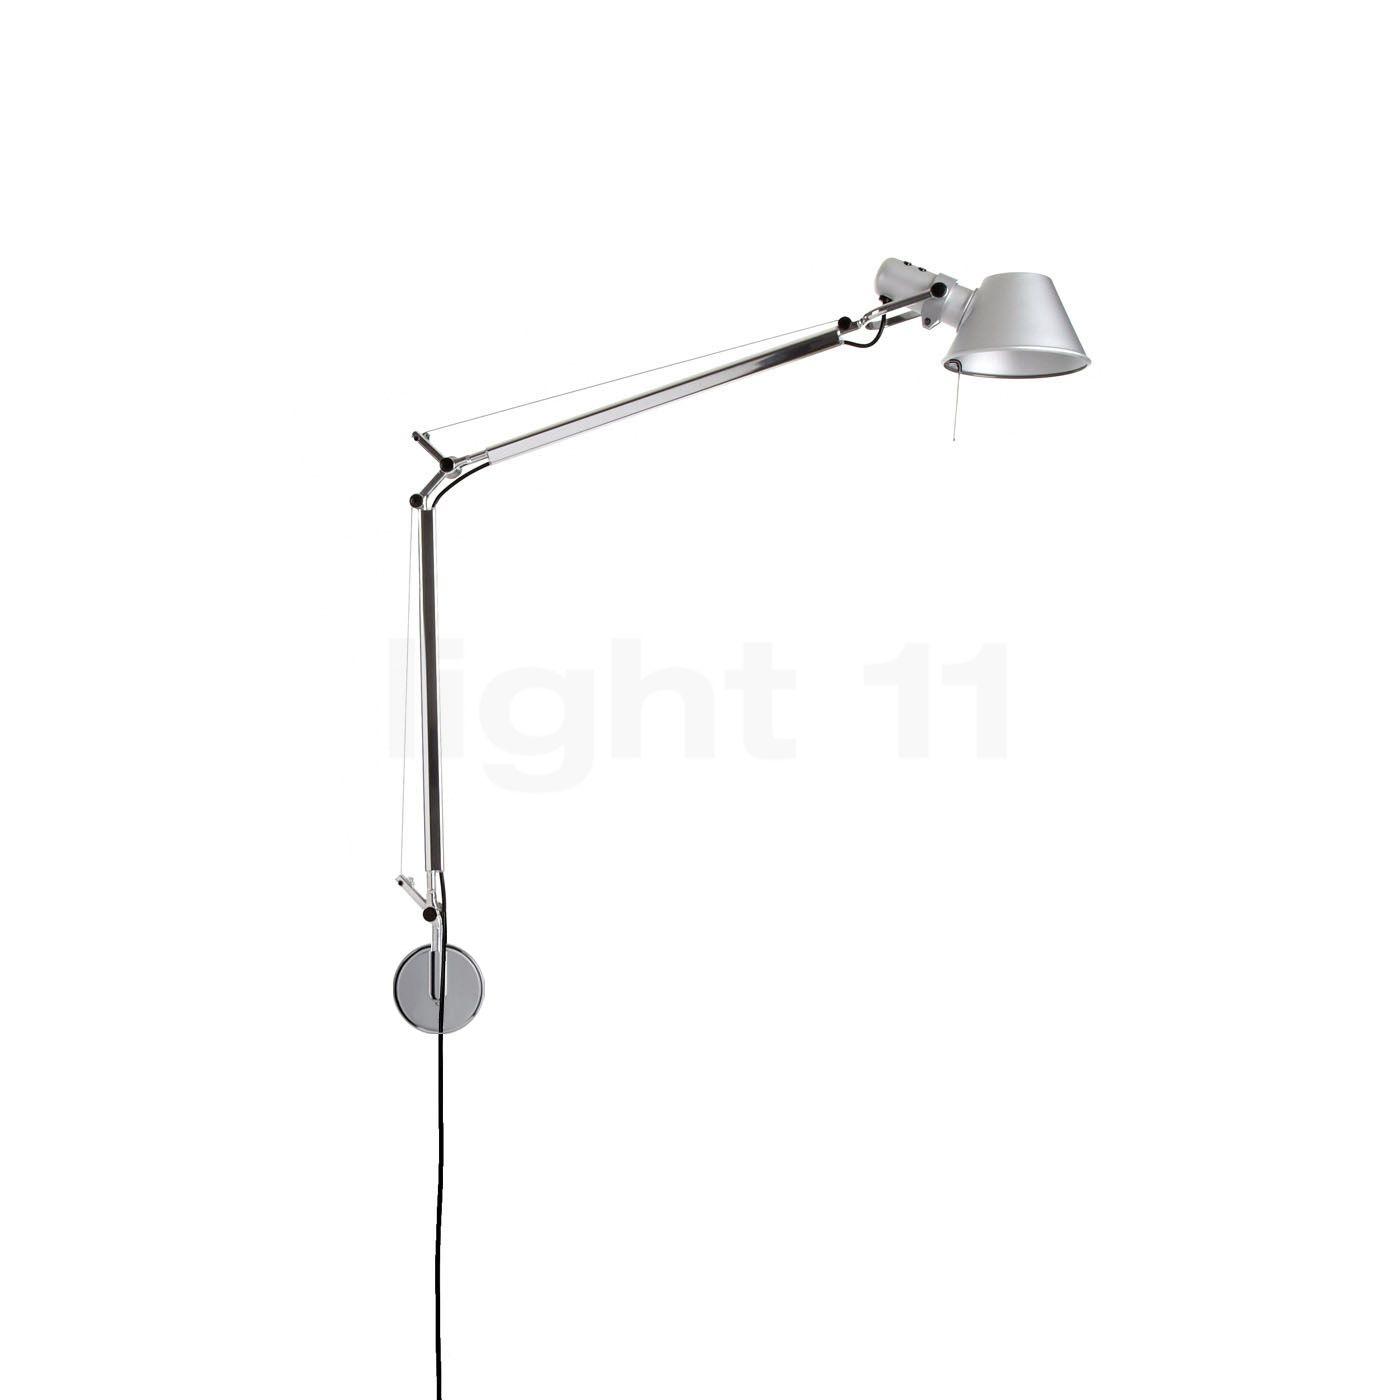 artemide tolomeo parete led tunable white wall lights. Black Bedroom Furniture Sets. Home Design Ideas